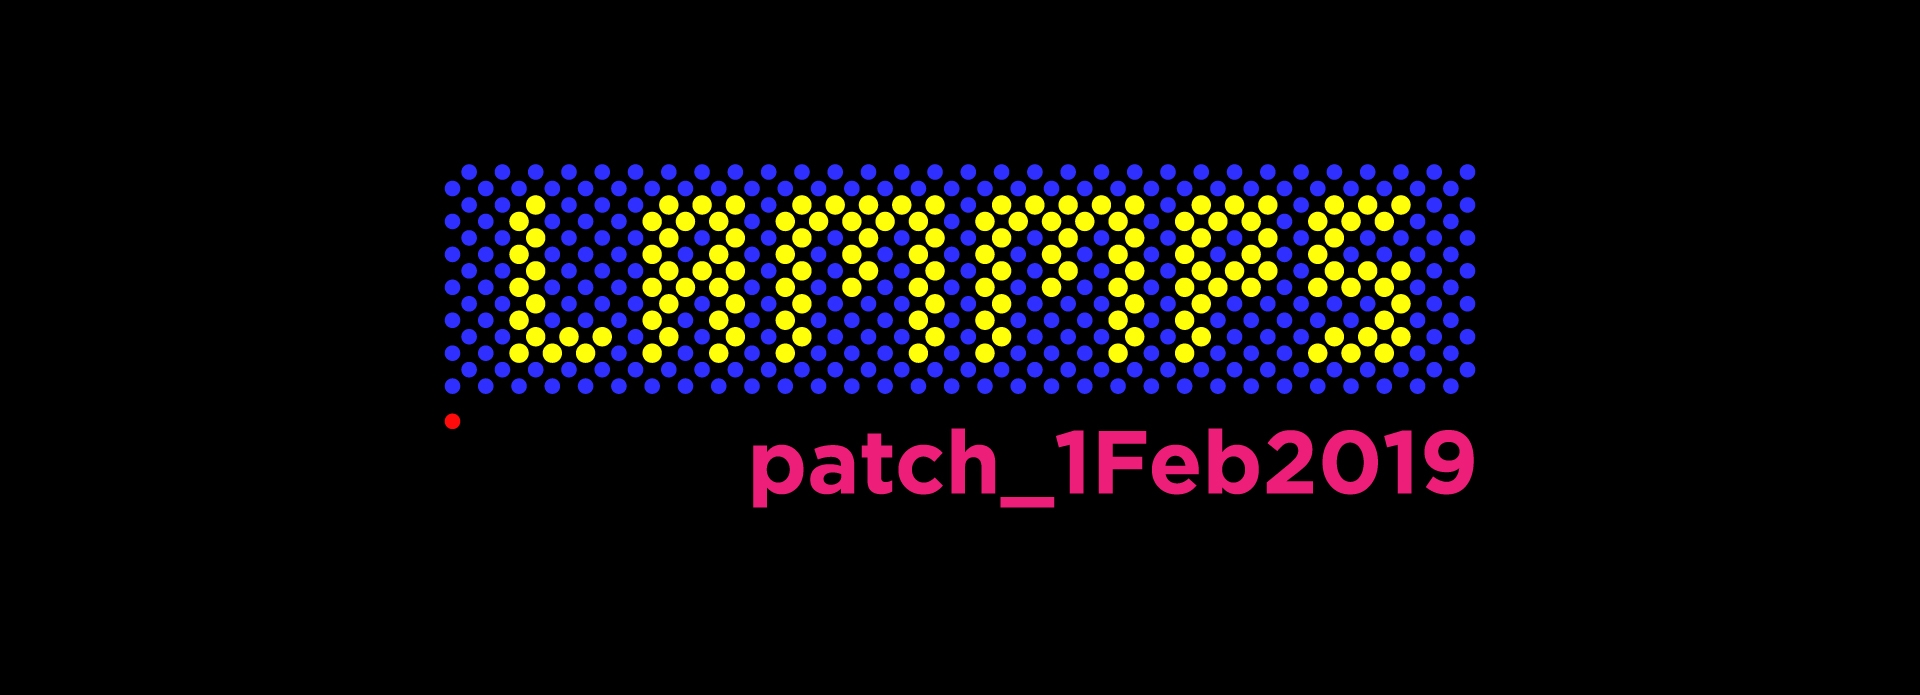 LAMMPS-patch-1Feb-2019.jpg